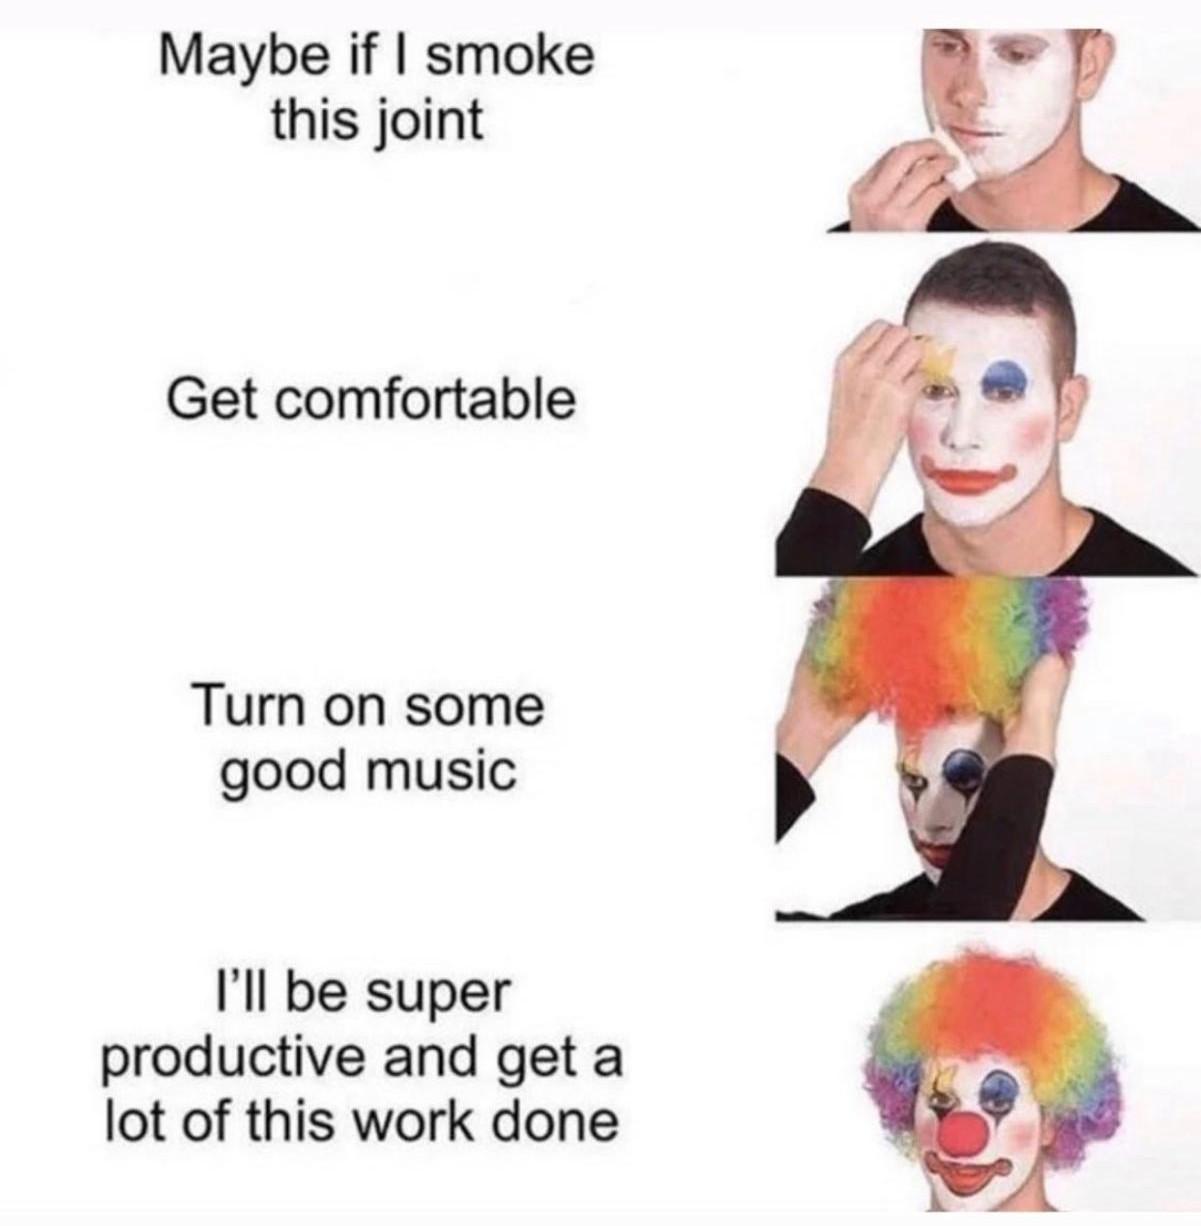 Drugs are bad - meme